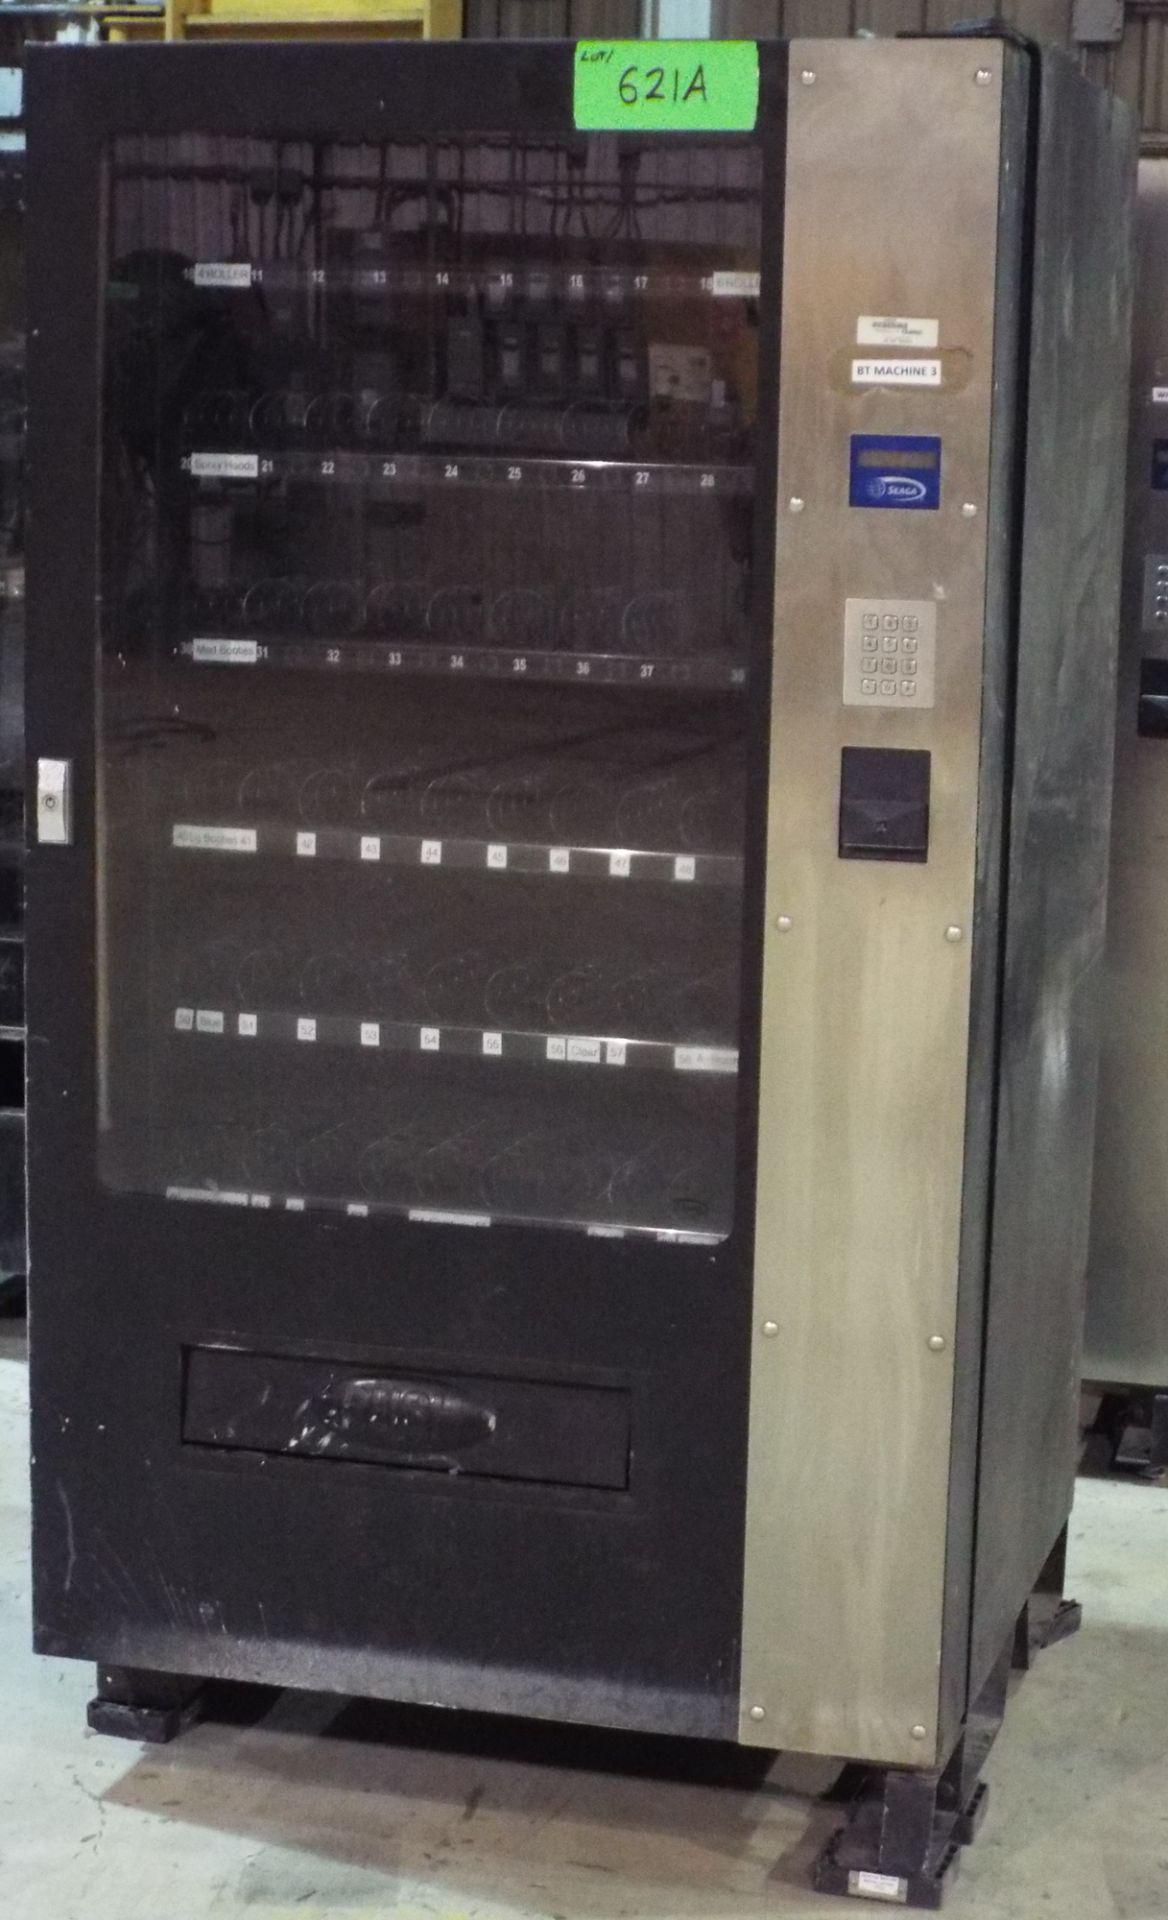 Lot 621A - SEAGA IQ640 INVENTORY CONTROL PARTS & PERISHABLES VENDING MACHINE, S/N: SK2461304217